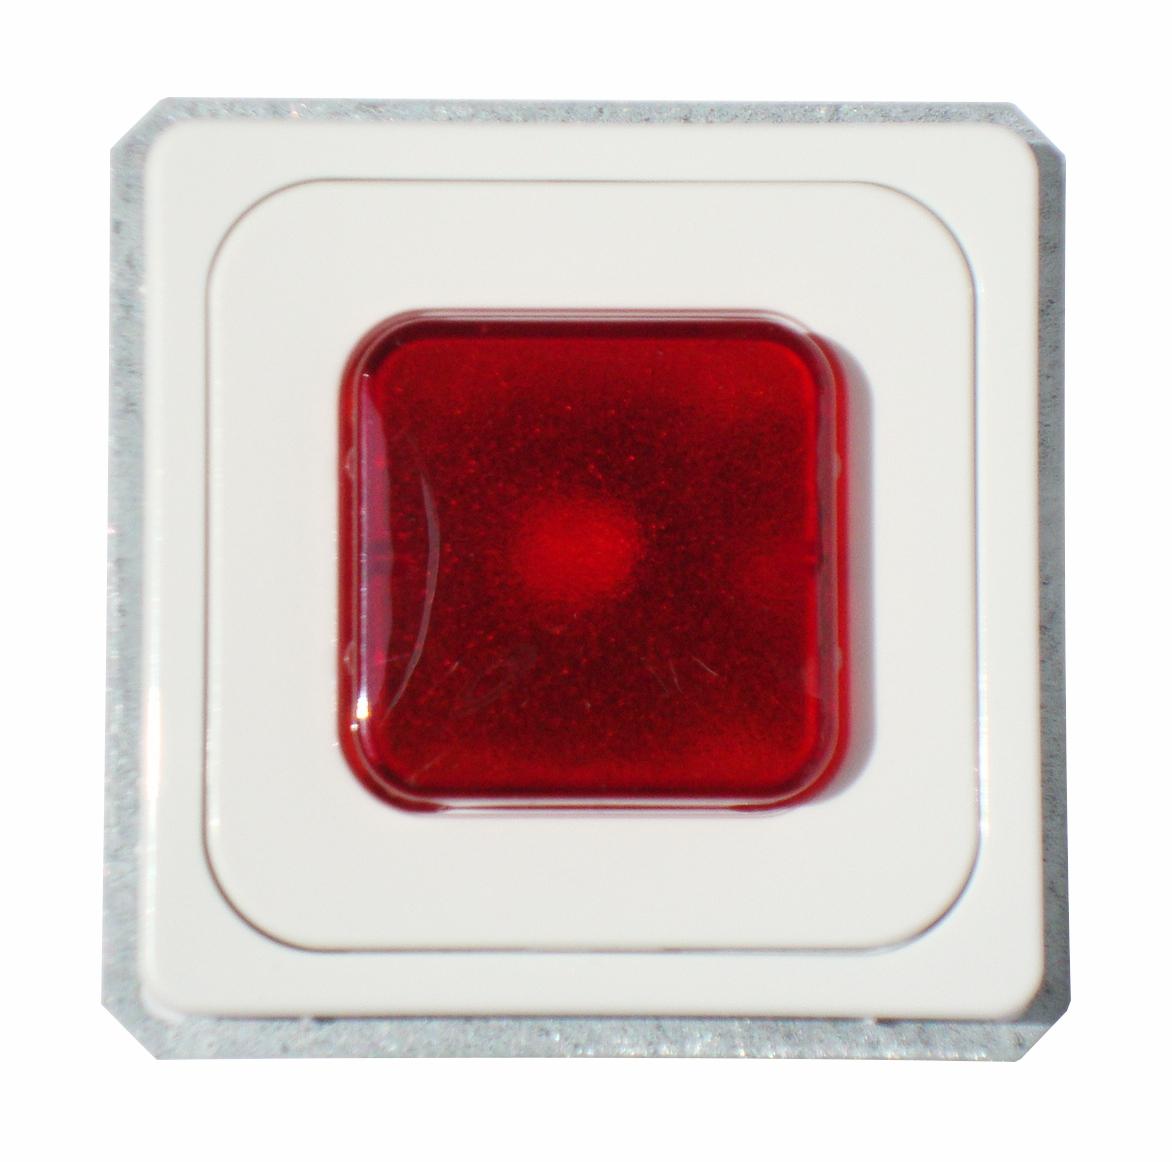 1 Stk UP-Paralleltaster E 10 mit Glimmlampe, Haube rot, rw EL202004--